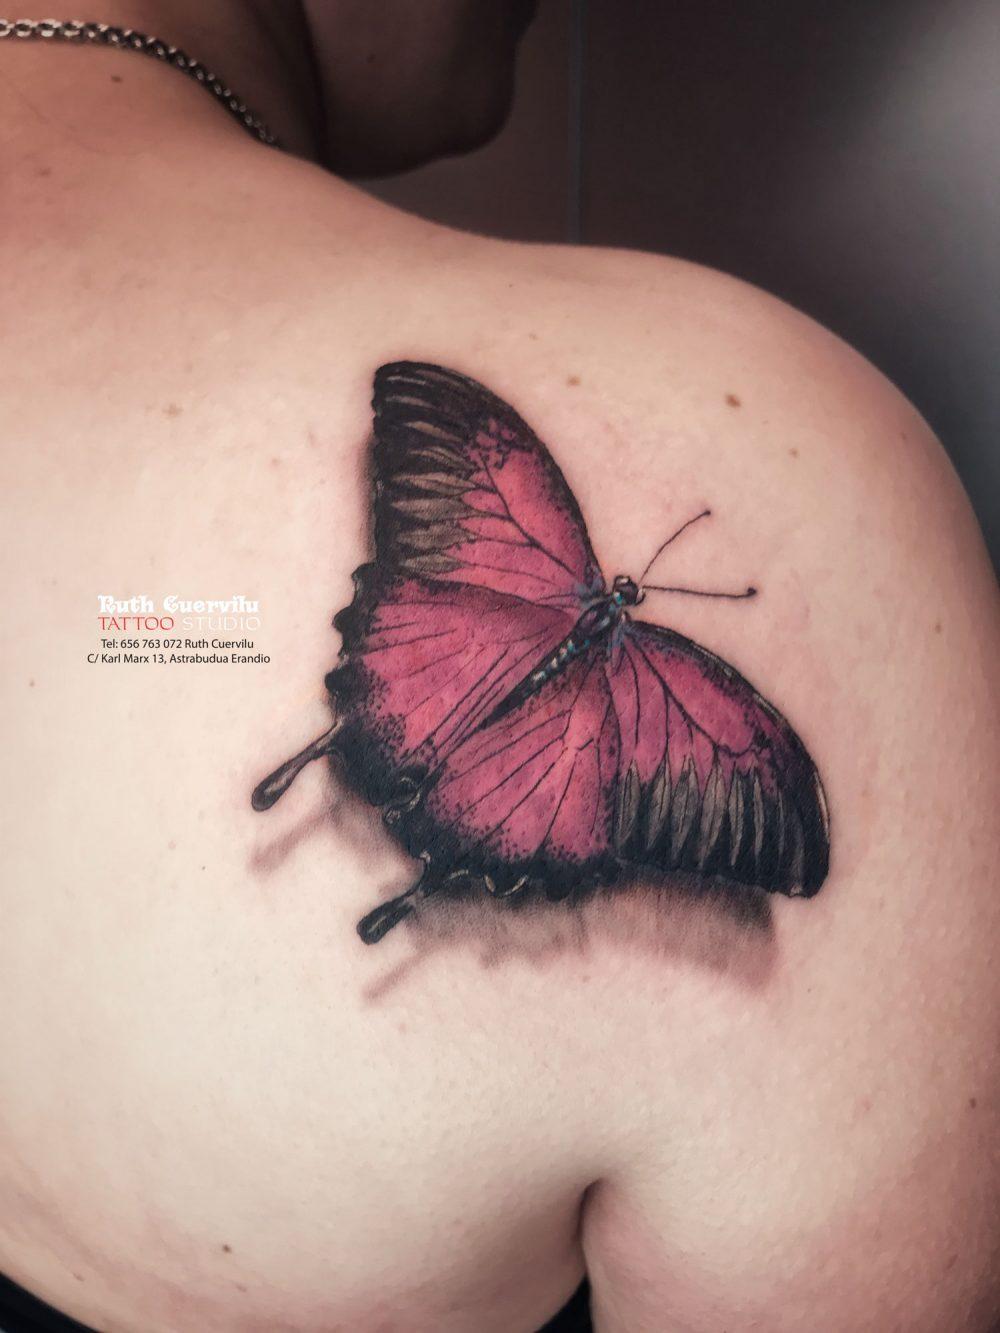 Tatuaje realista mariposa a color sobre hombro de mujer - El amor lo cambia todo - Ruth Cuervilu Tattoo - KM13 Studio - Estudio de tatuajes en Astrabudua-Erandio Bizkaia Bilbao Getxo Leioa Barakaldo Gasteiz